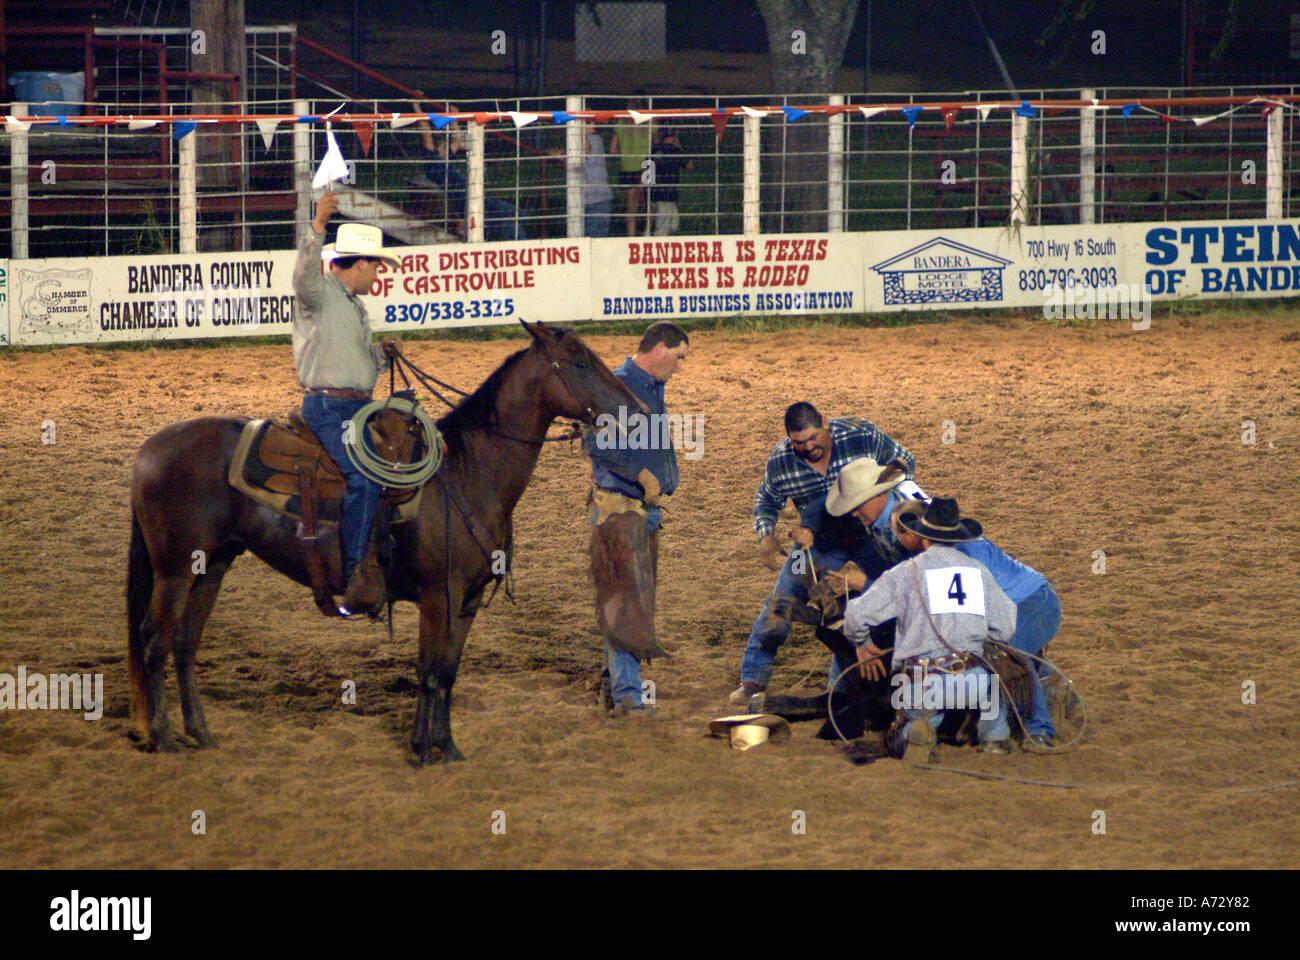 Cowboys Texan Rodeo In Bandera Texas Stock Photo Royalty